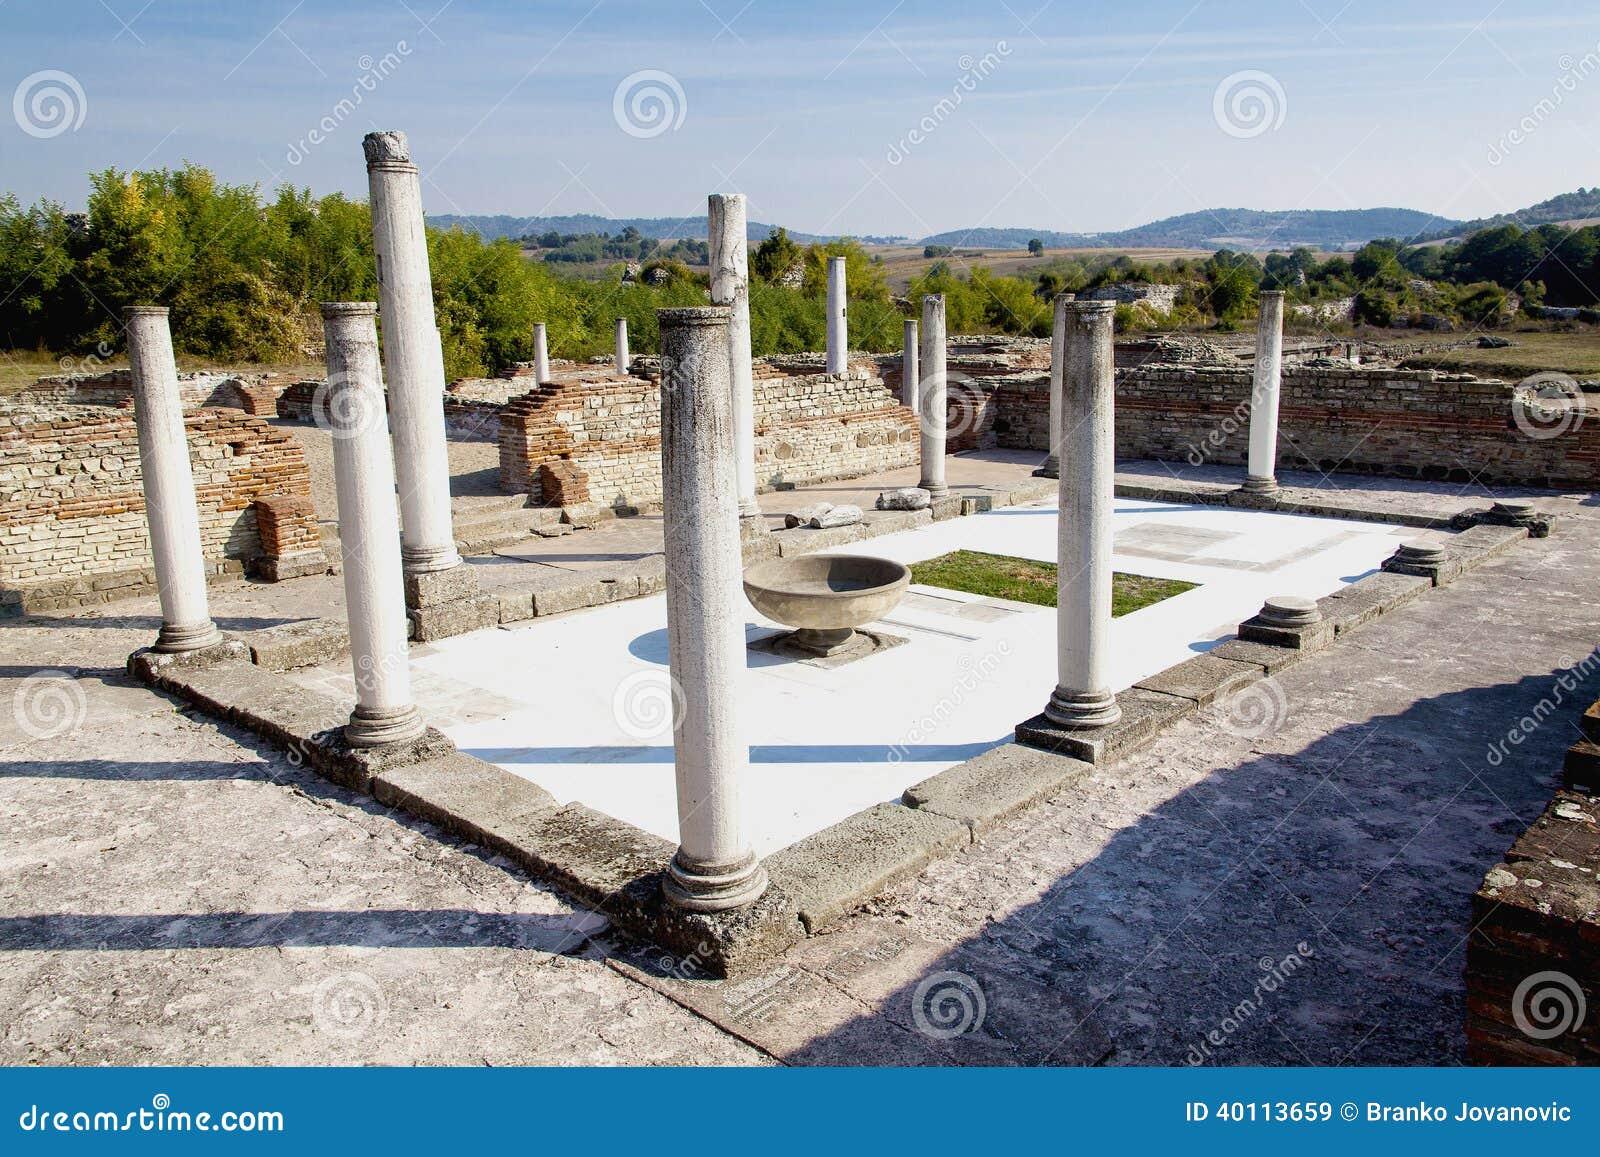 Archaeological site Felix Romuliana